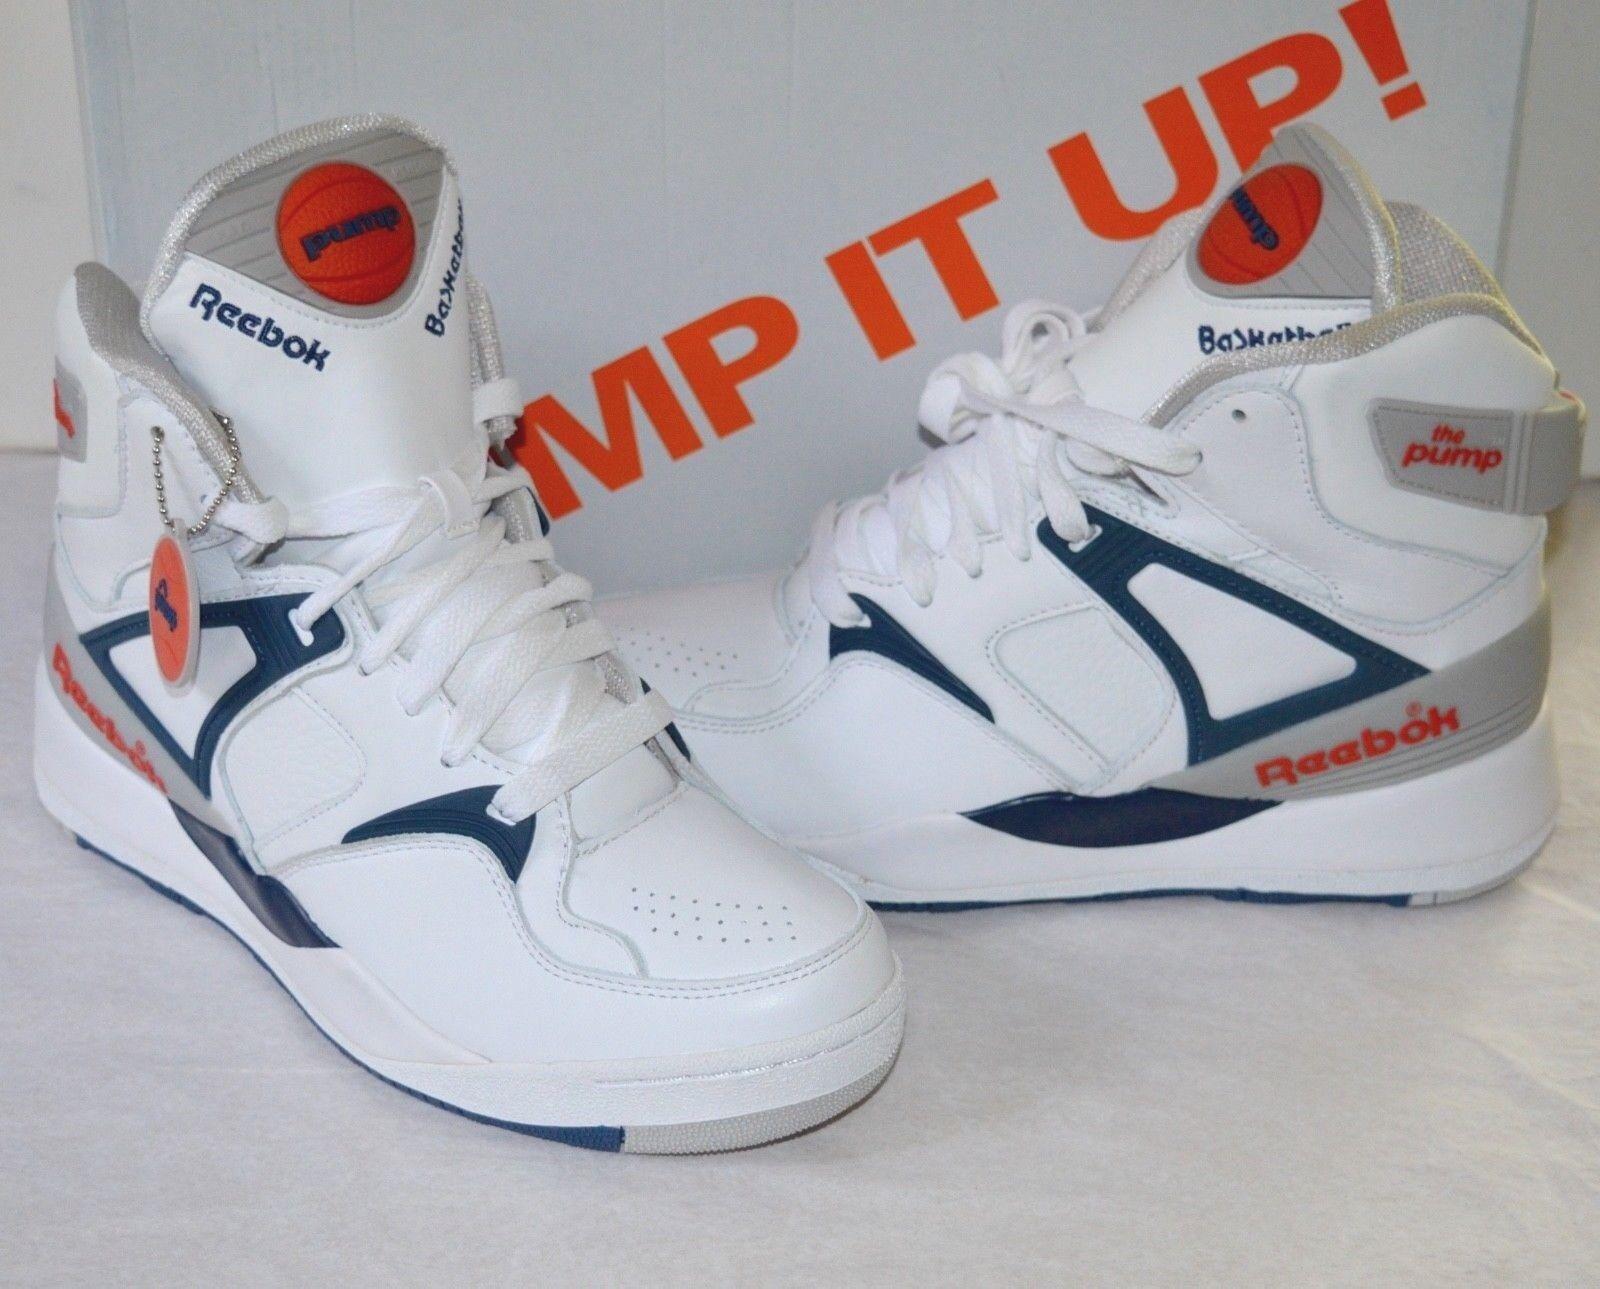 New Reebok The Pump 1989 White/Royal/Sheer/Orange sz  8.5